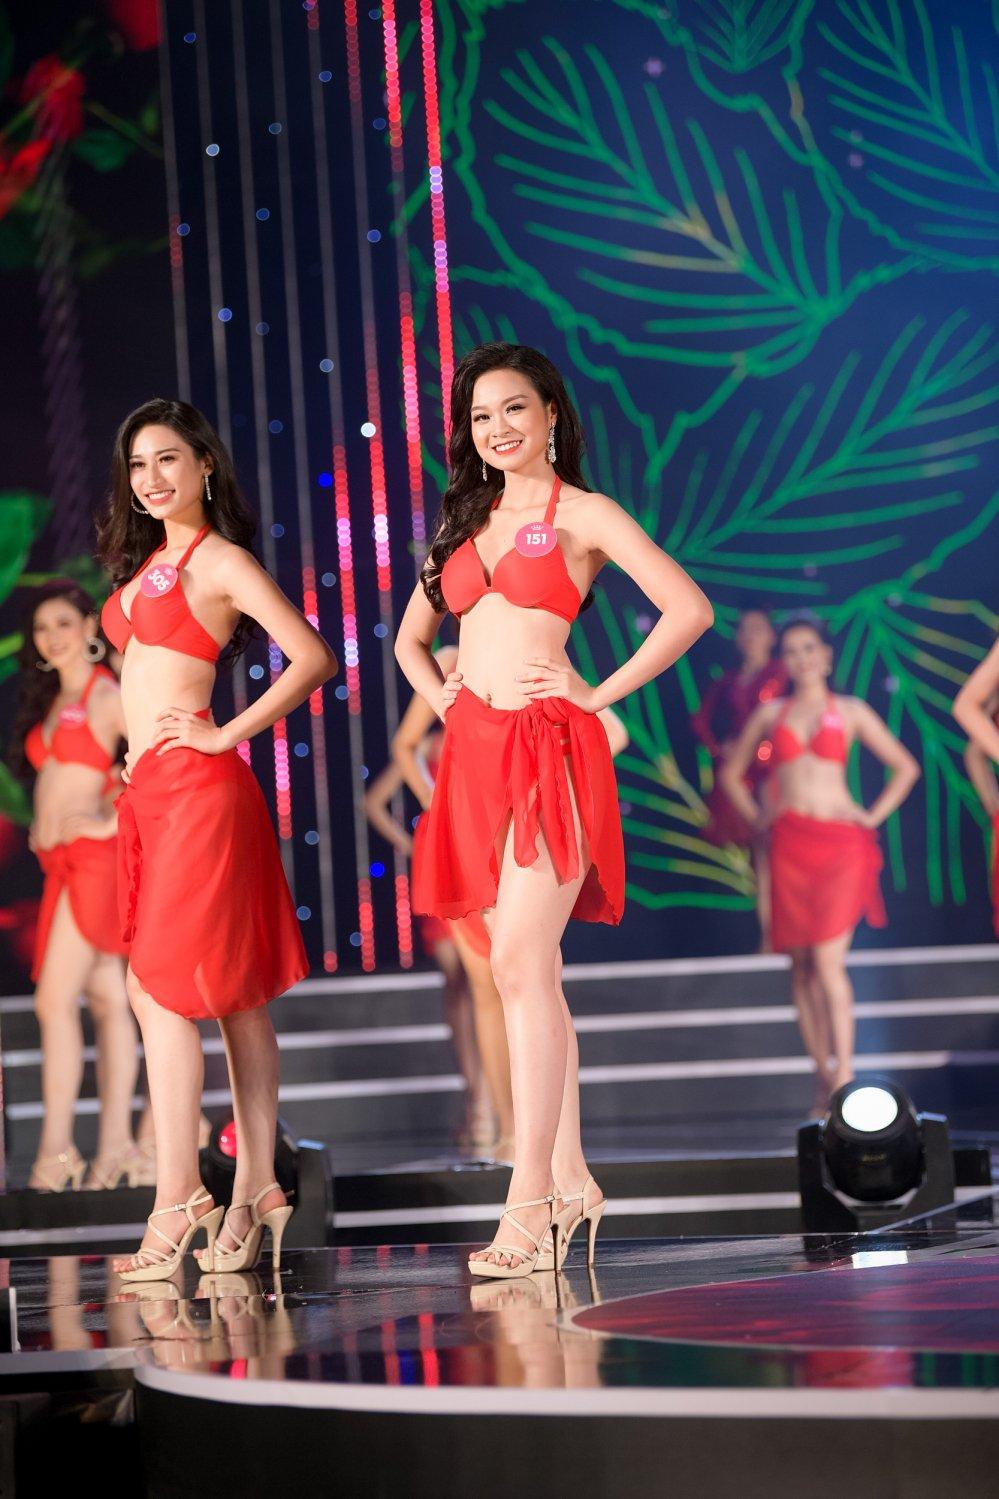 Lo dien 19 thi sinh dau tien buoc vao chung ket 'Hoa hau Viet Nam 2018' hinh anh 10